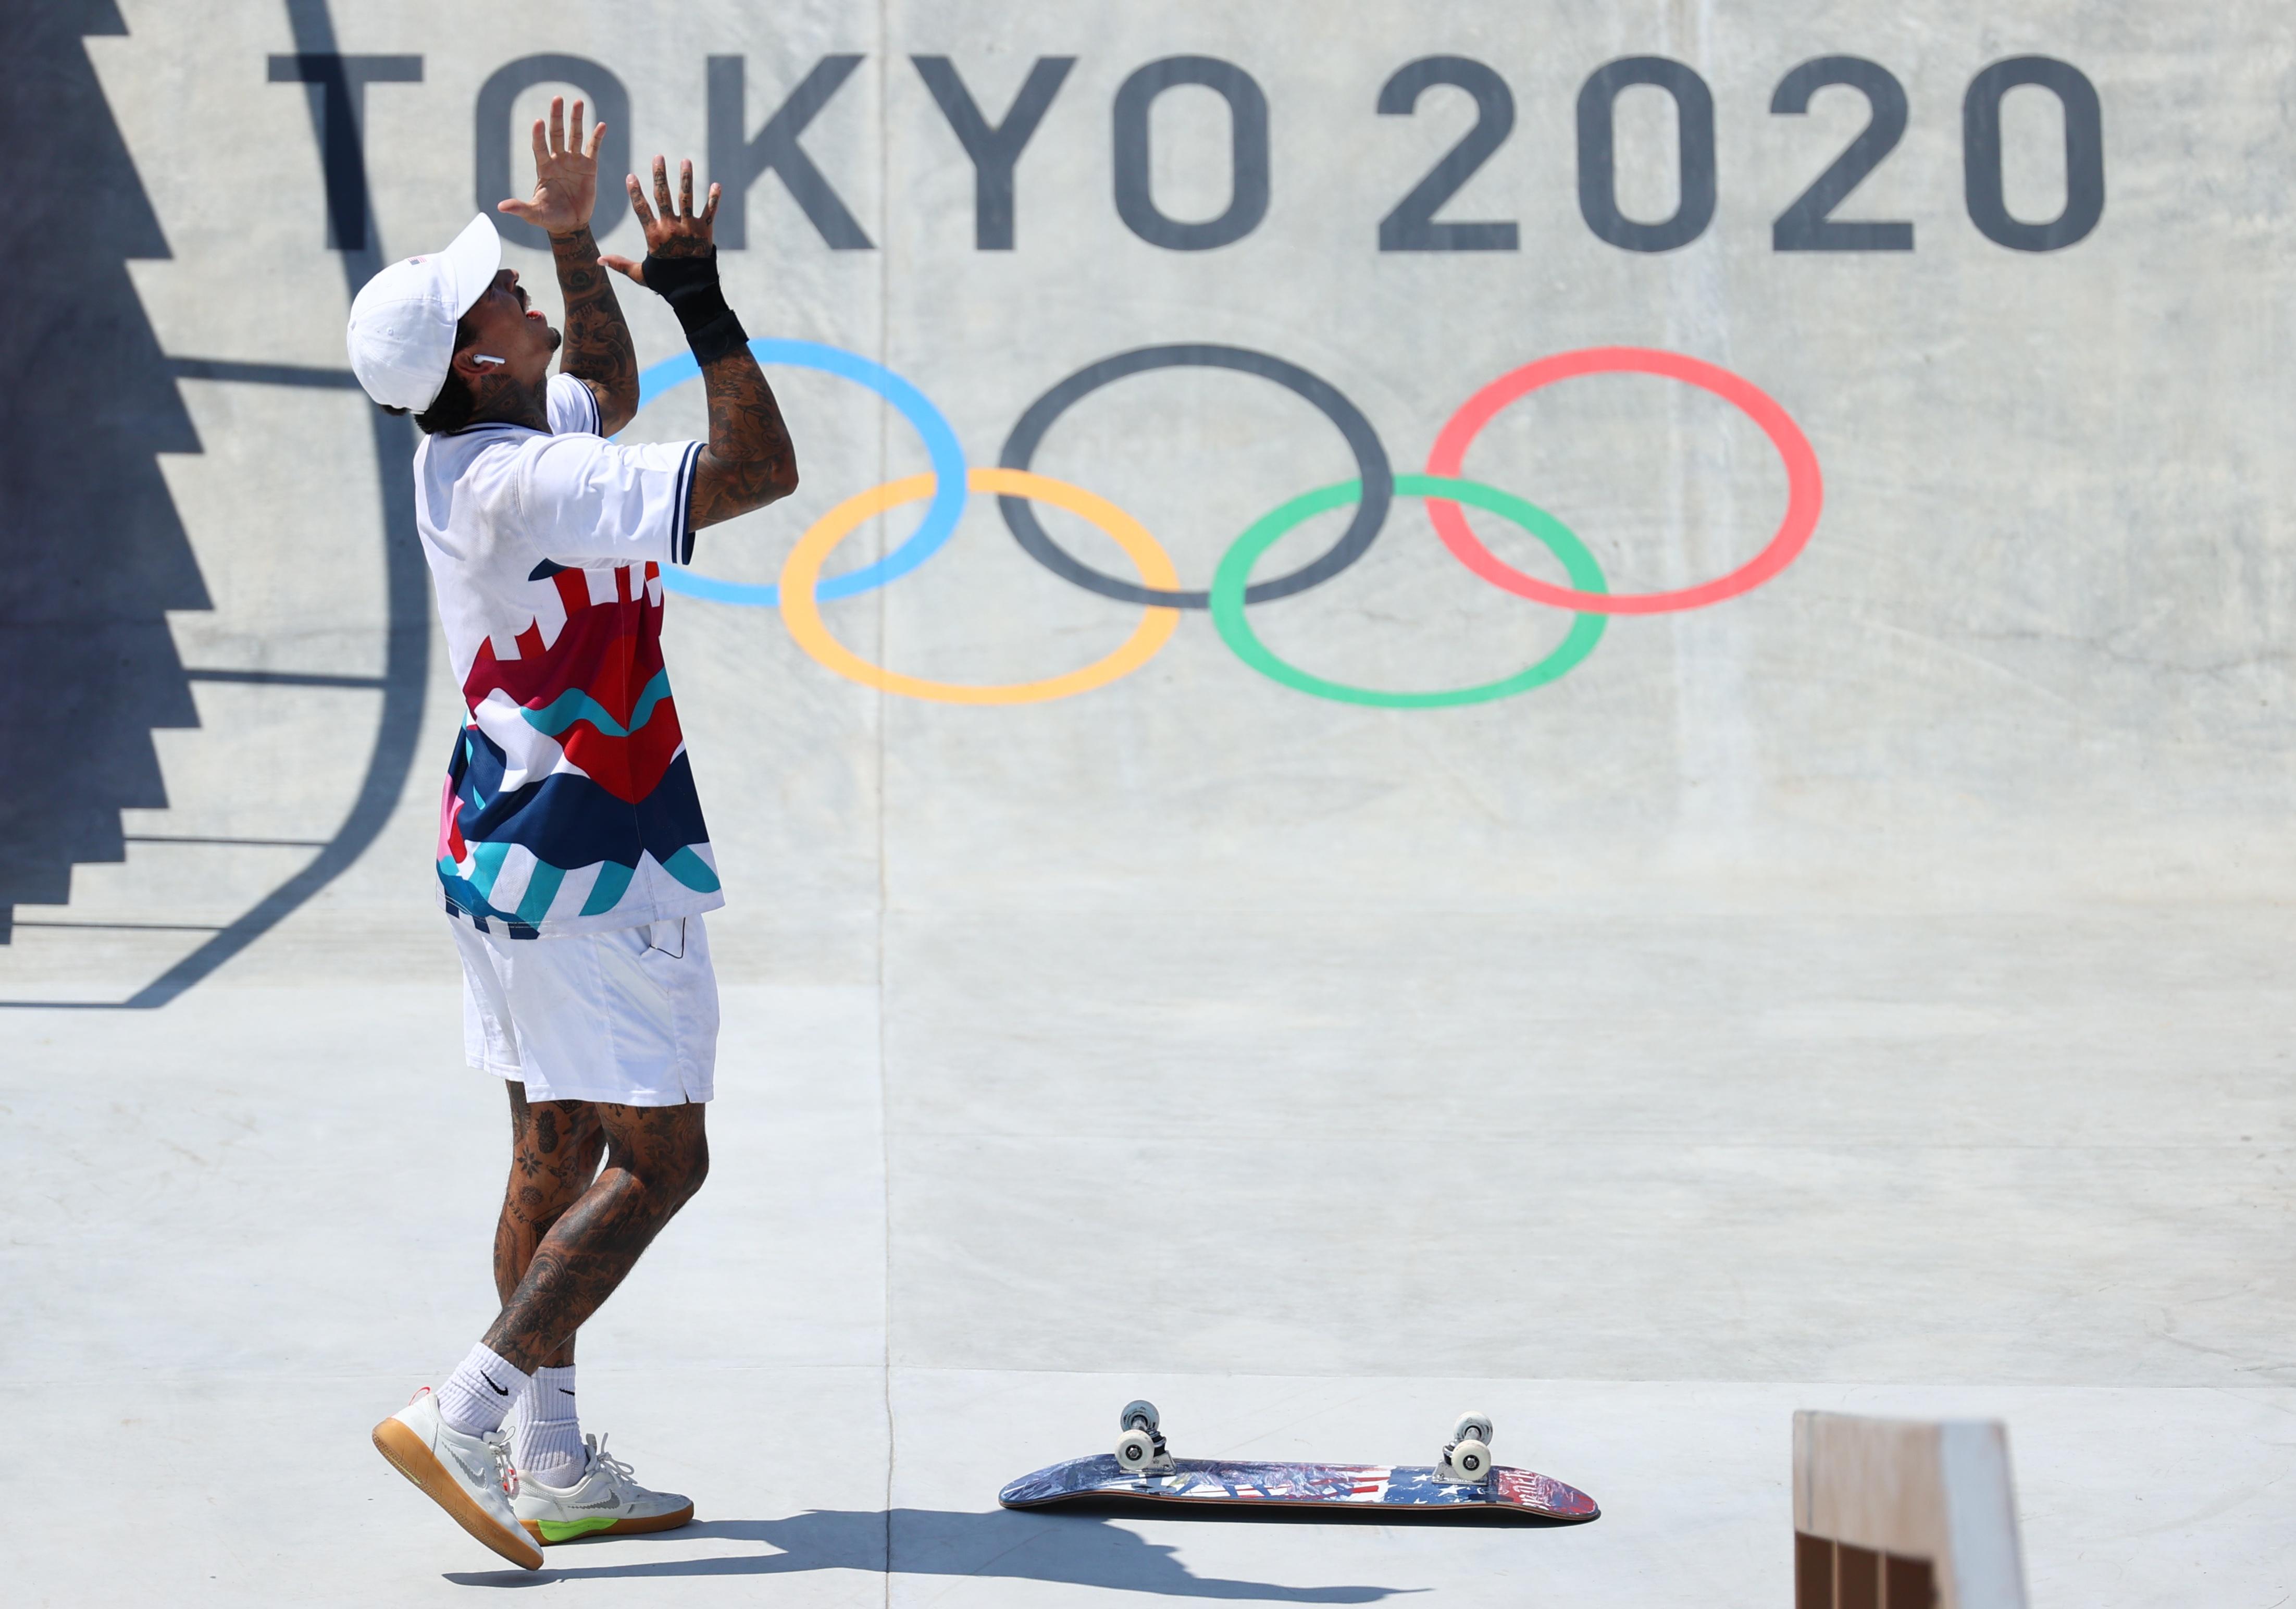 Tokyo 2020 Olympics - Skateboarding - Men's Street - Final - Ariake Urban Sports Park - Tokyo, Japan - July 25, 2021. Nyjah Huston of the United States reacts. REUTERS/Lucy Nicholson